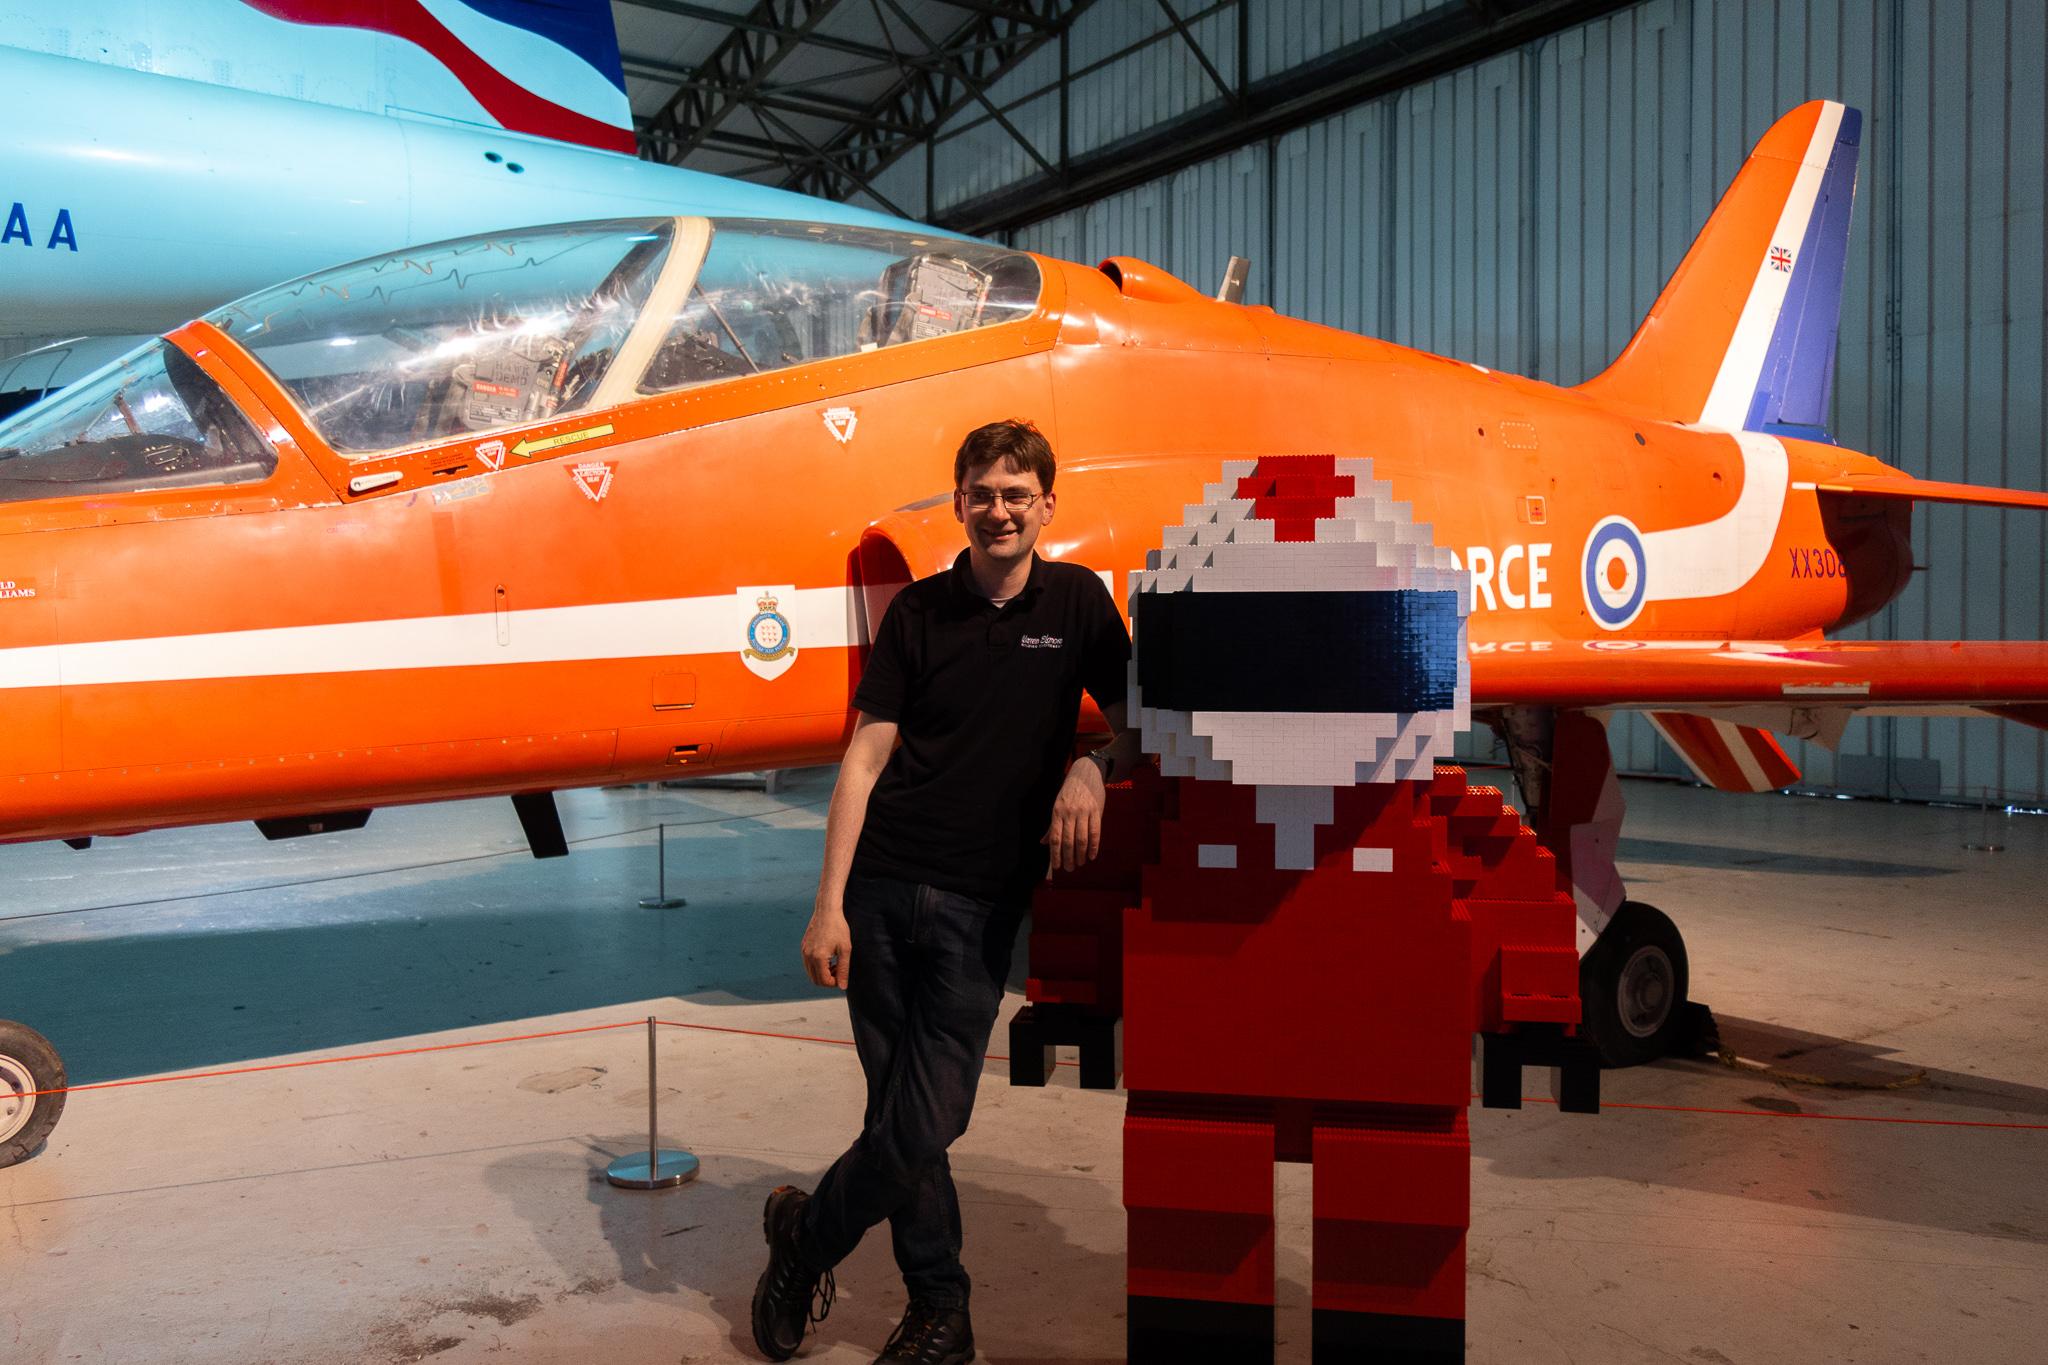 Red Arrows Pilot.jpg